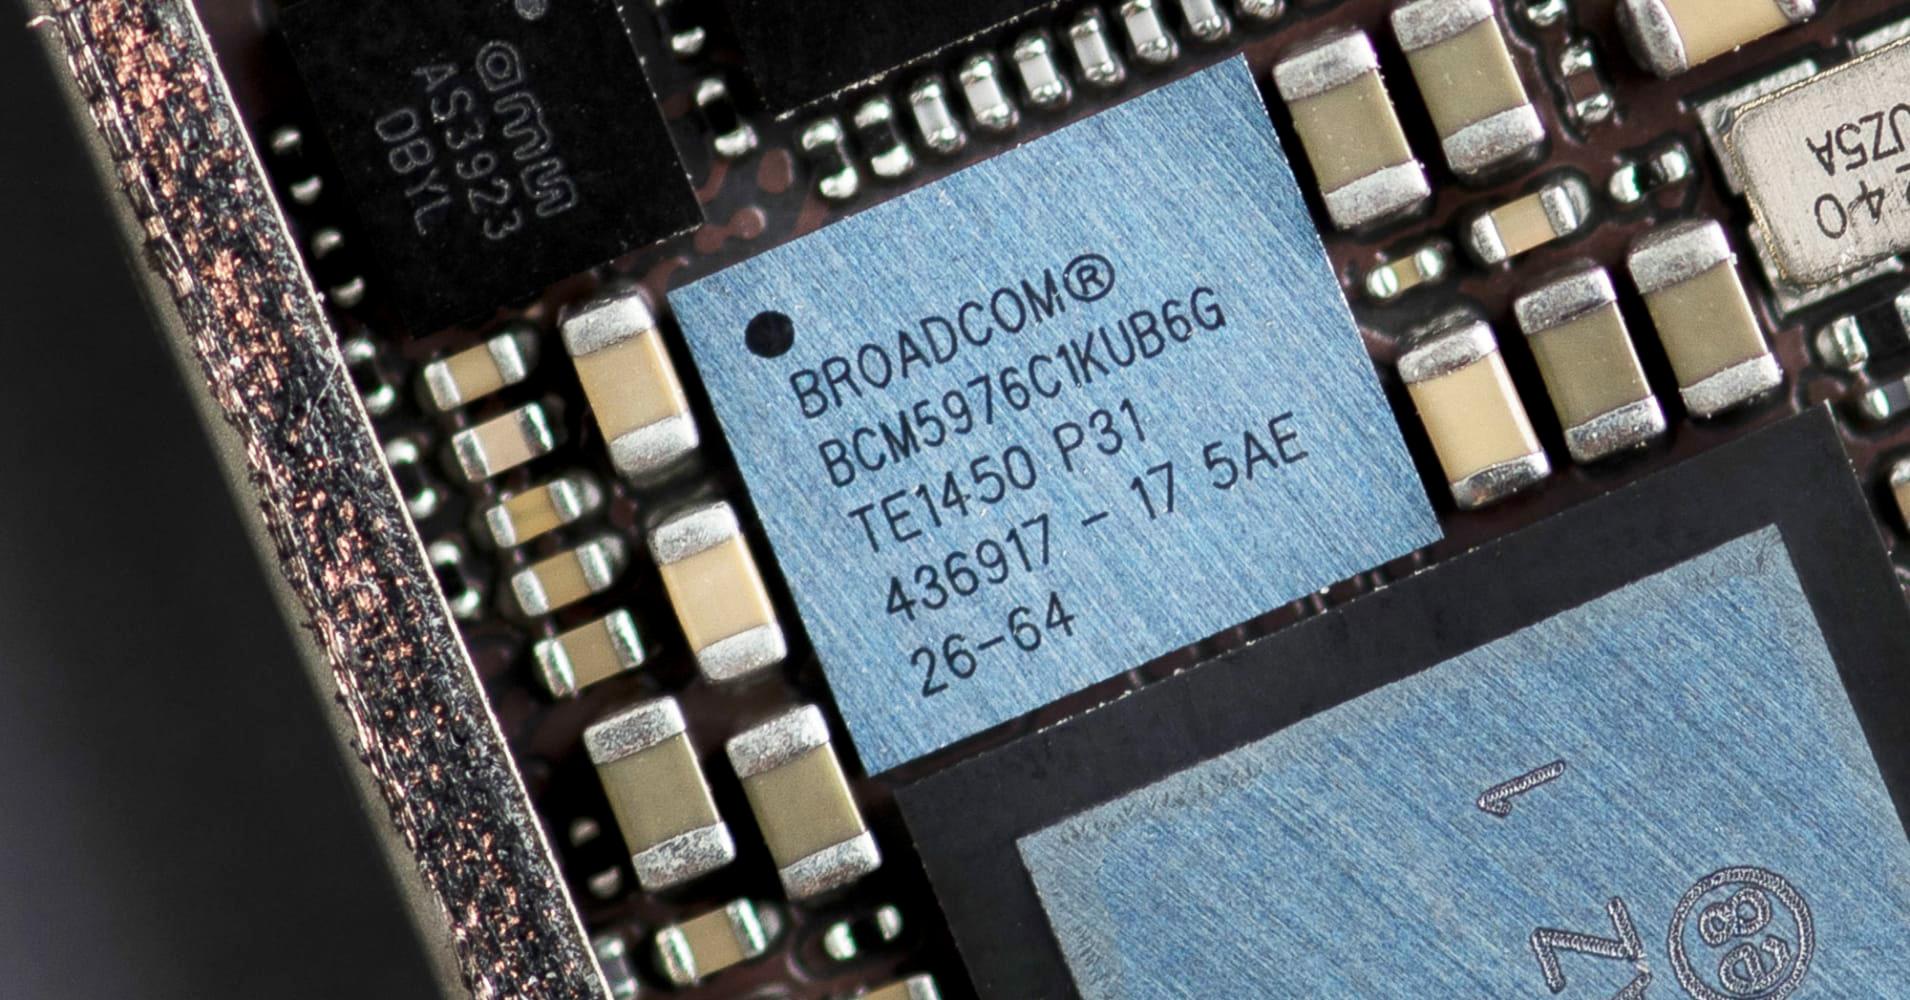 https://www.macfreak.nl/modules/news/images/zArt.BroadcomChip.jpg